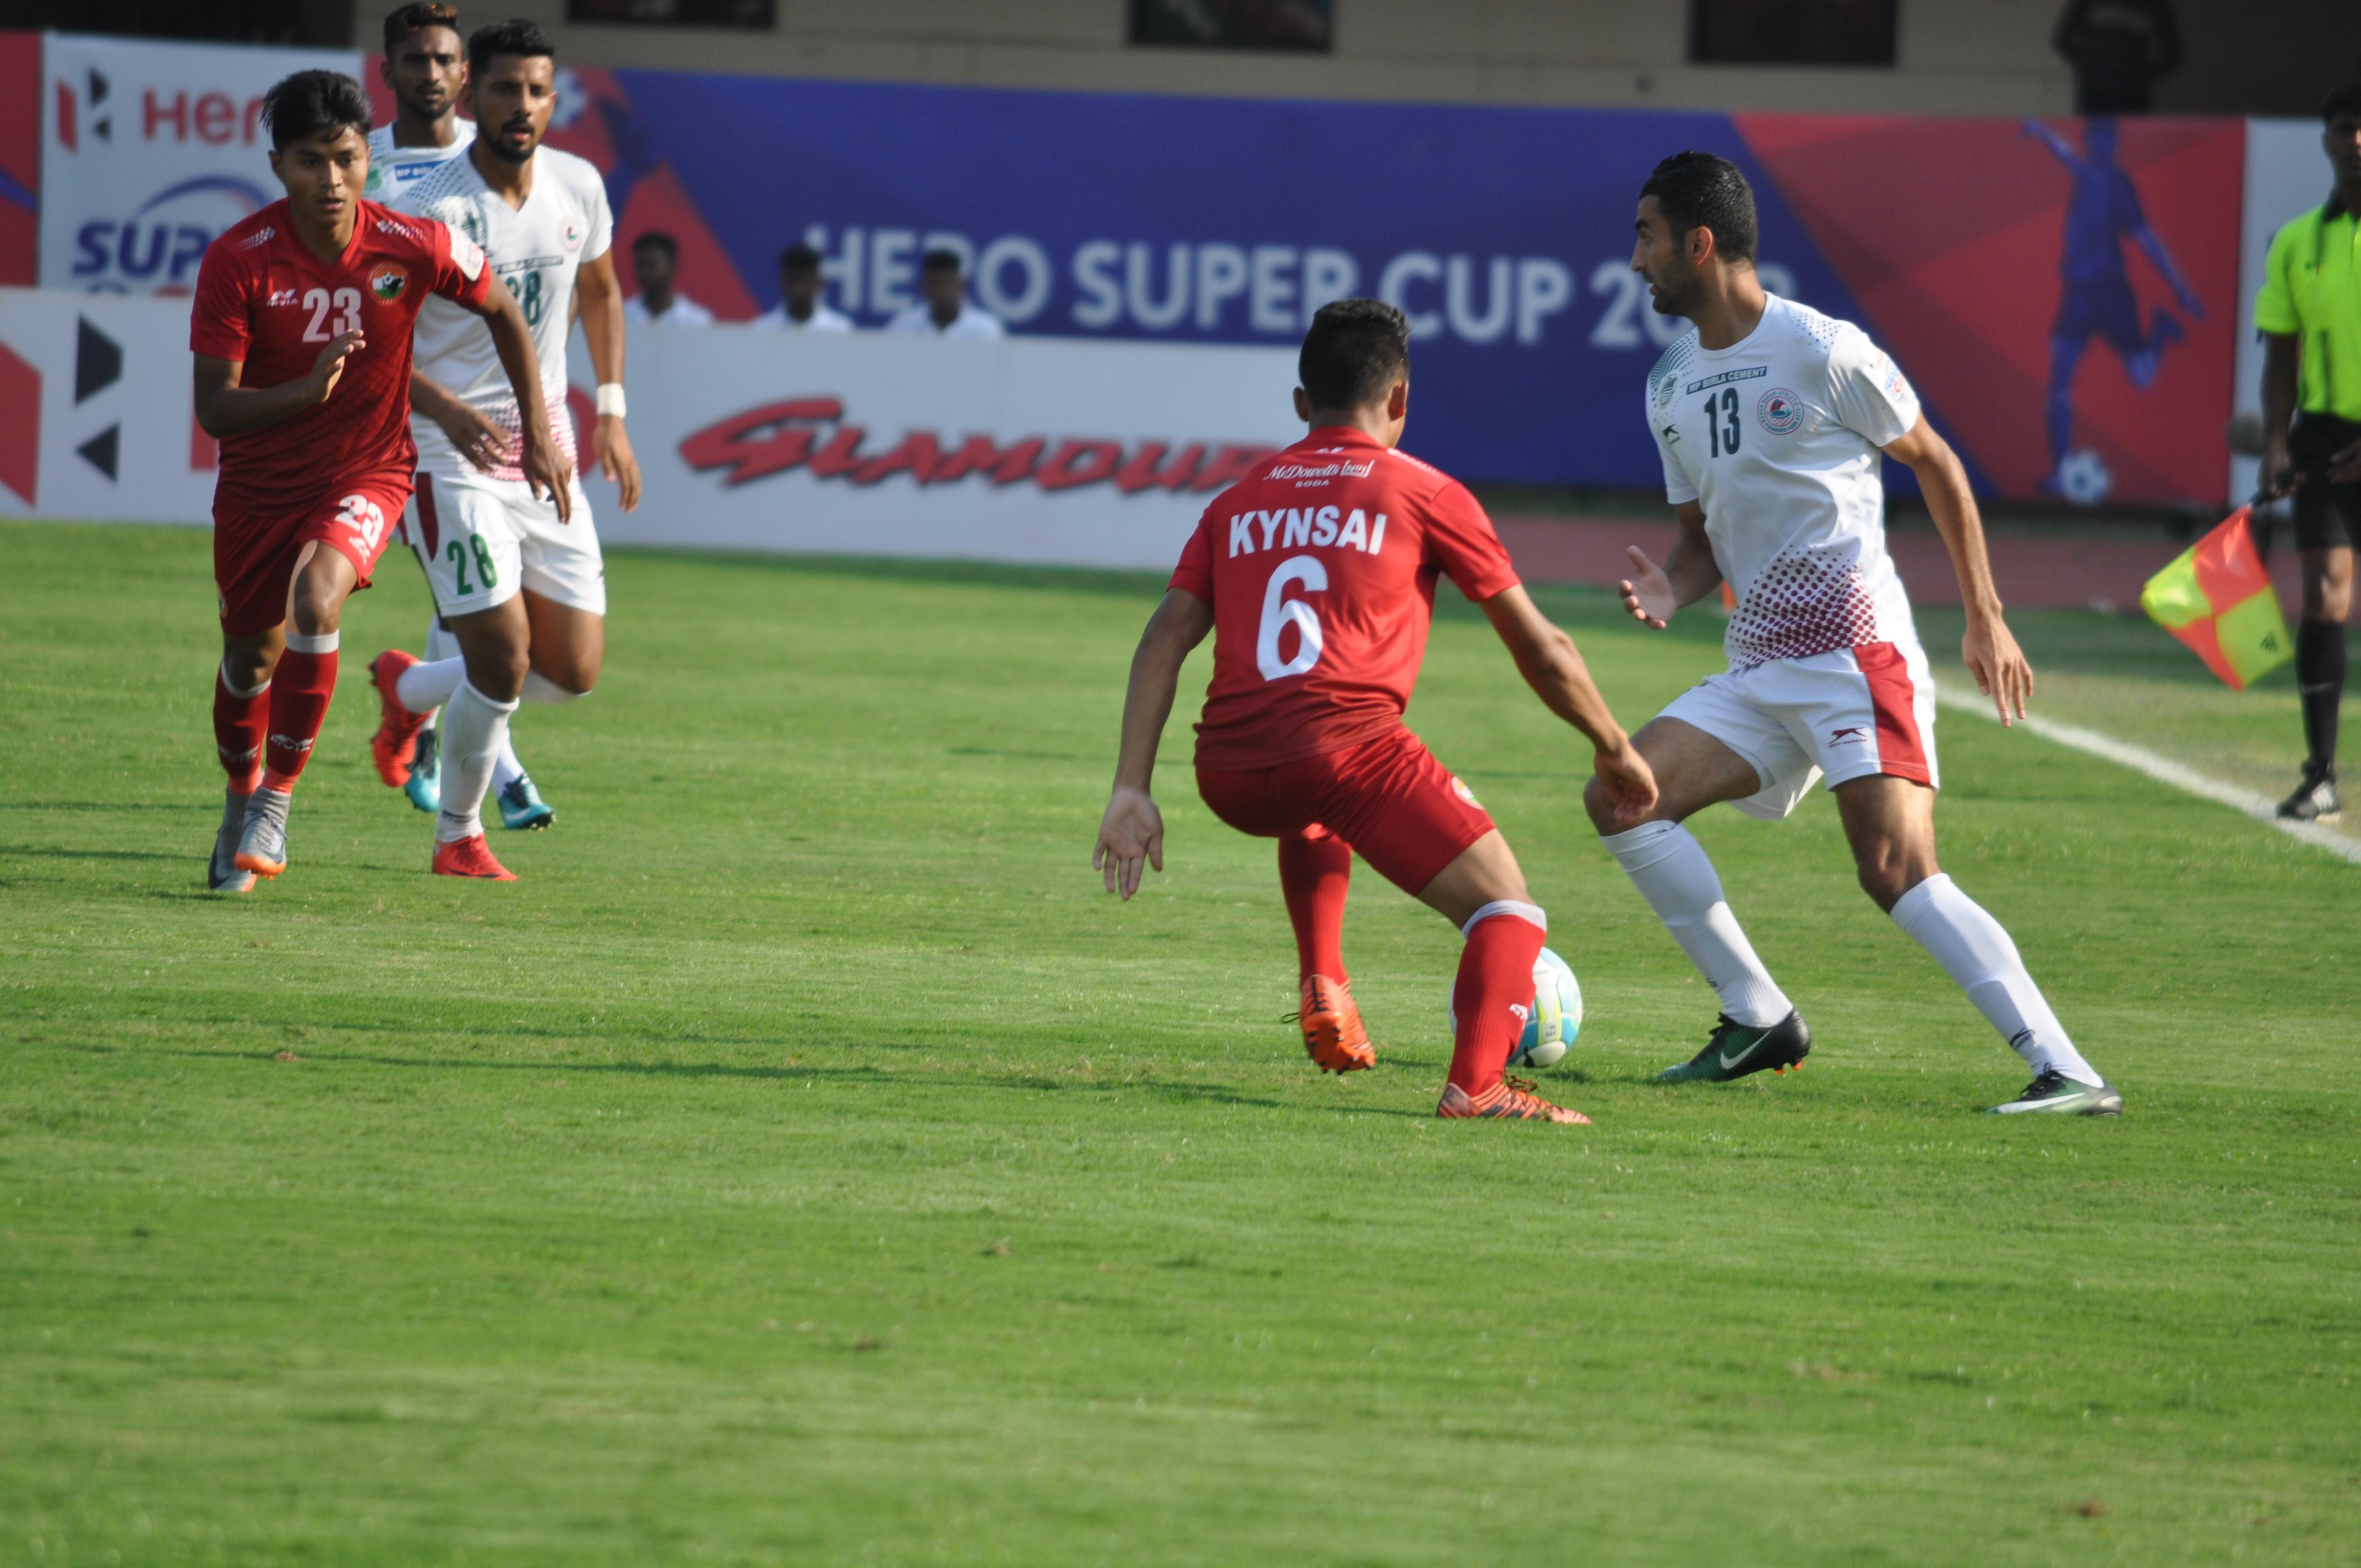 Mohun Bagan Shillong Lajong Super Cup